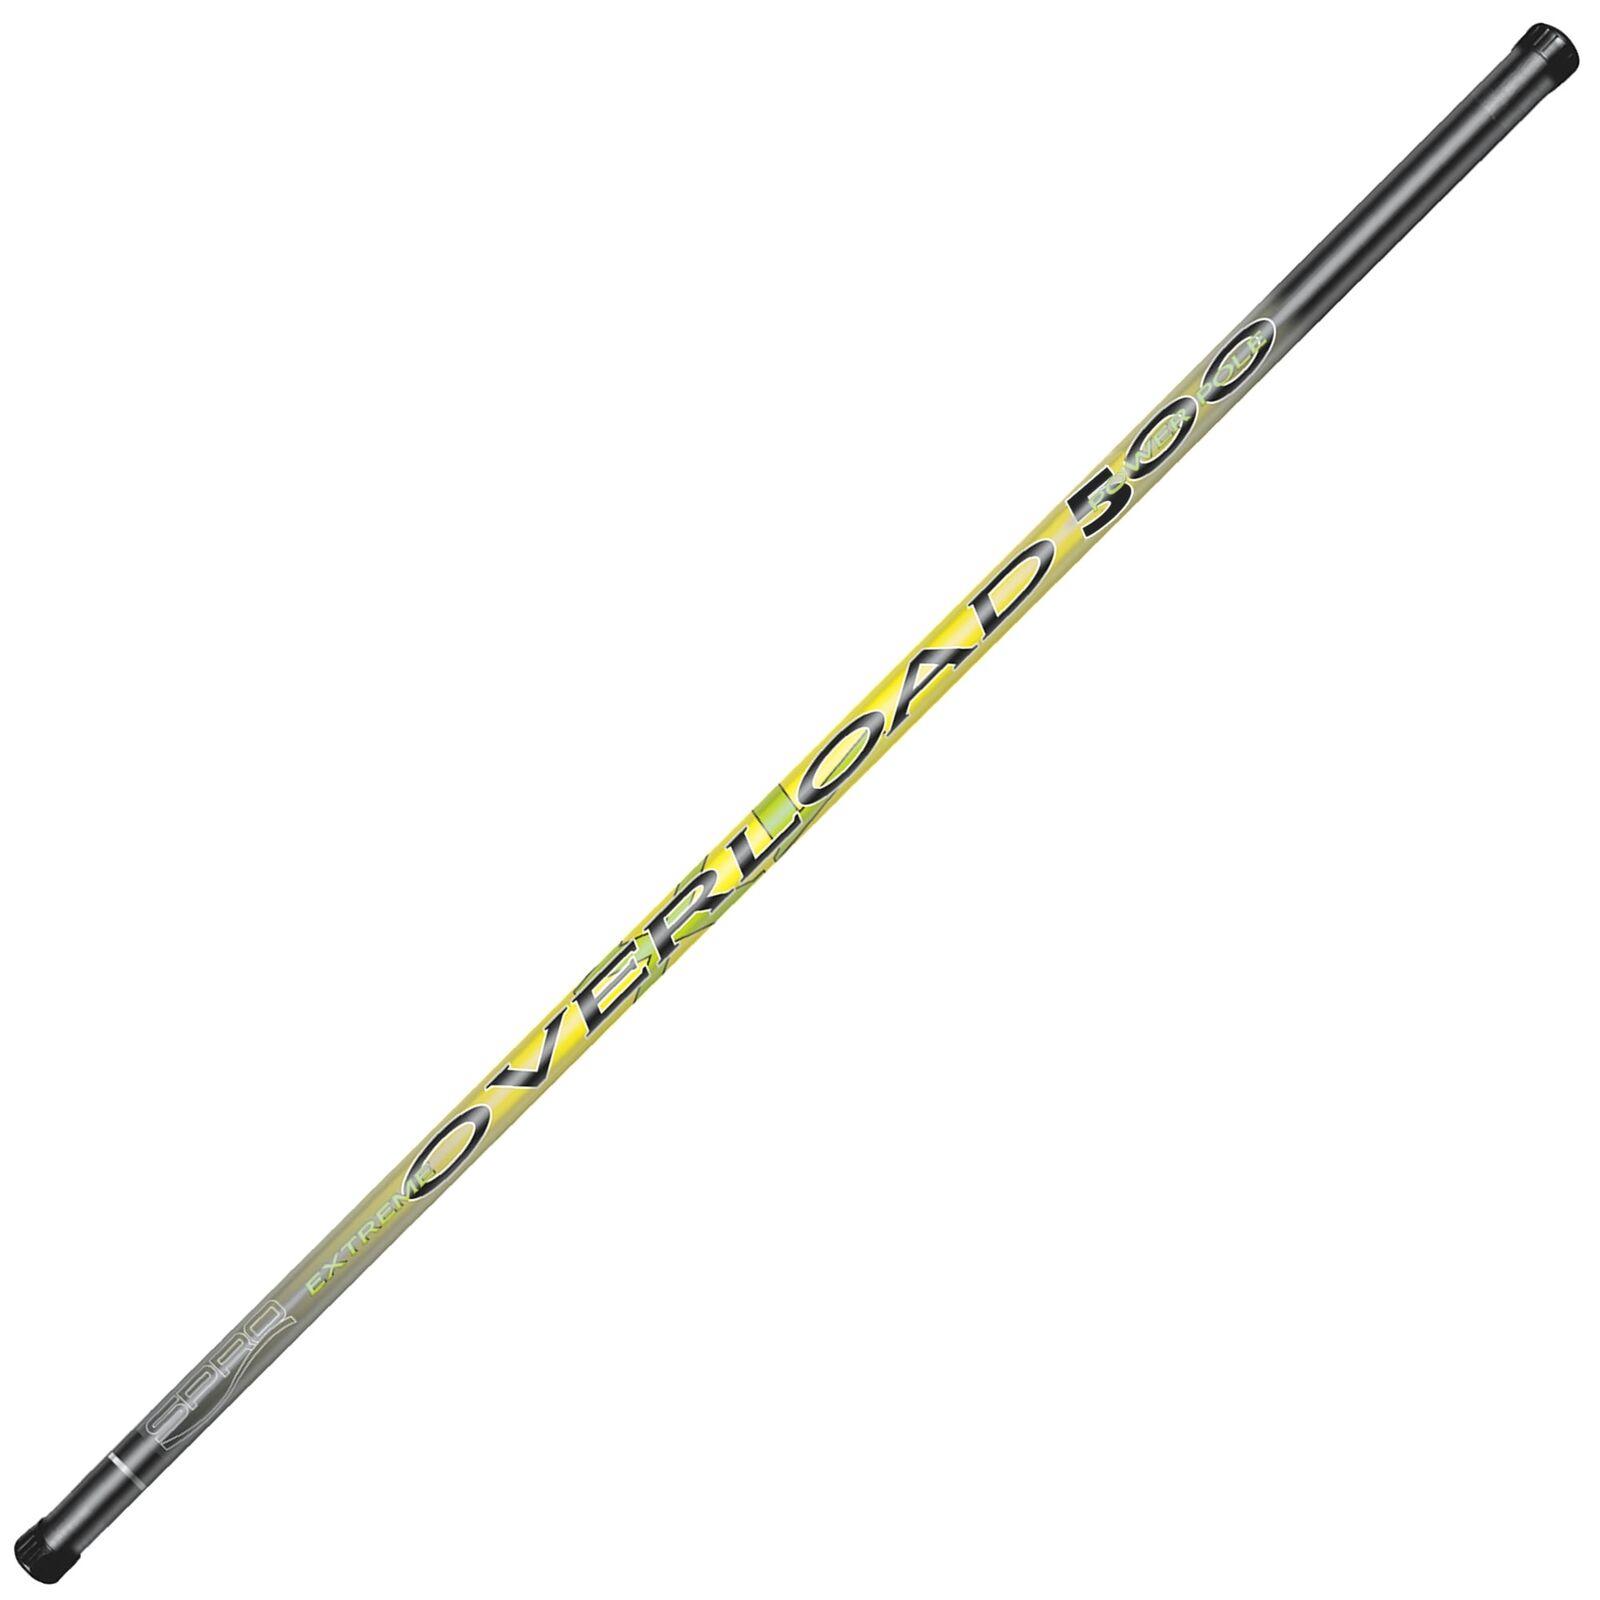 SPRO Overload Power Pole 500 600 700 Stipprute ohne Ringe Kopfrute Friedfisch